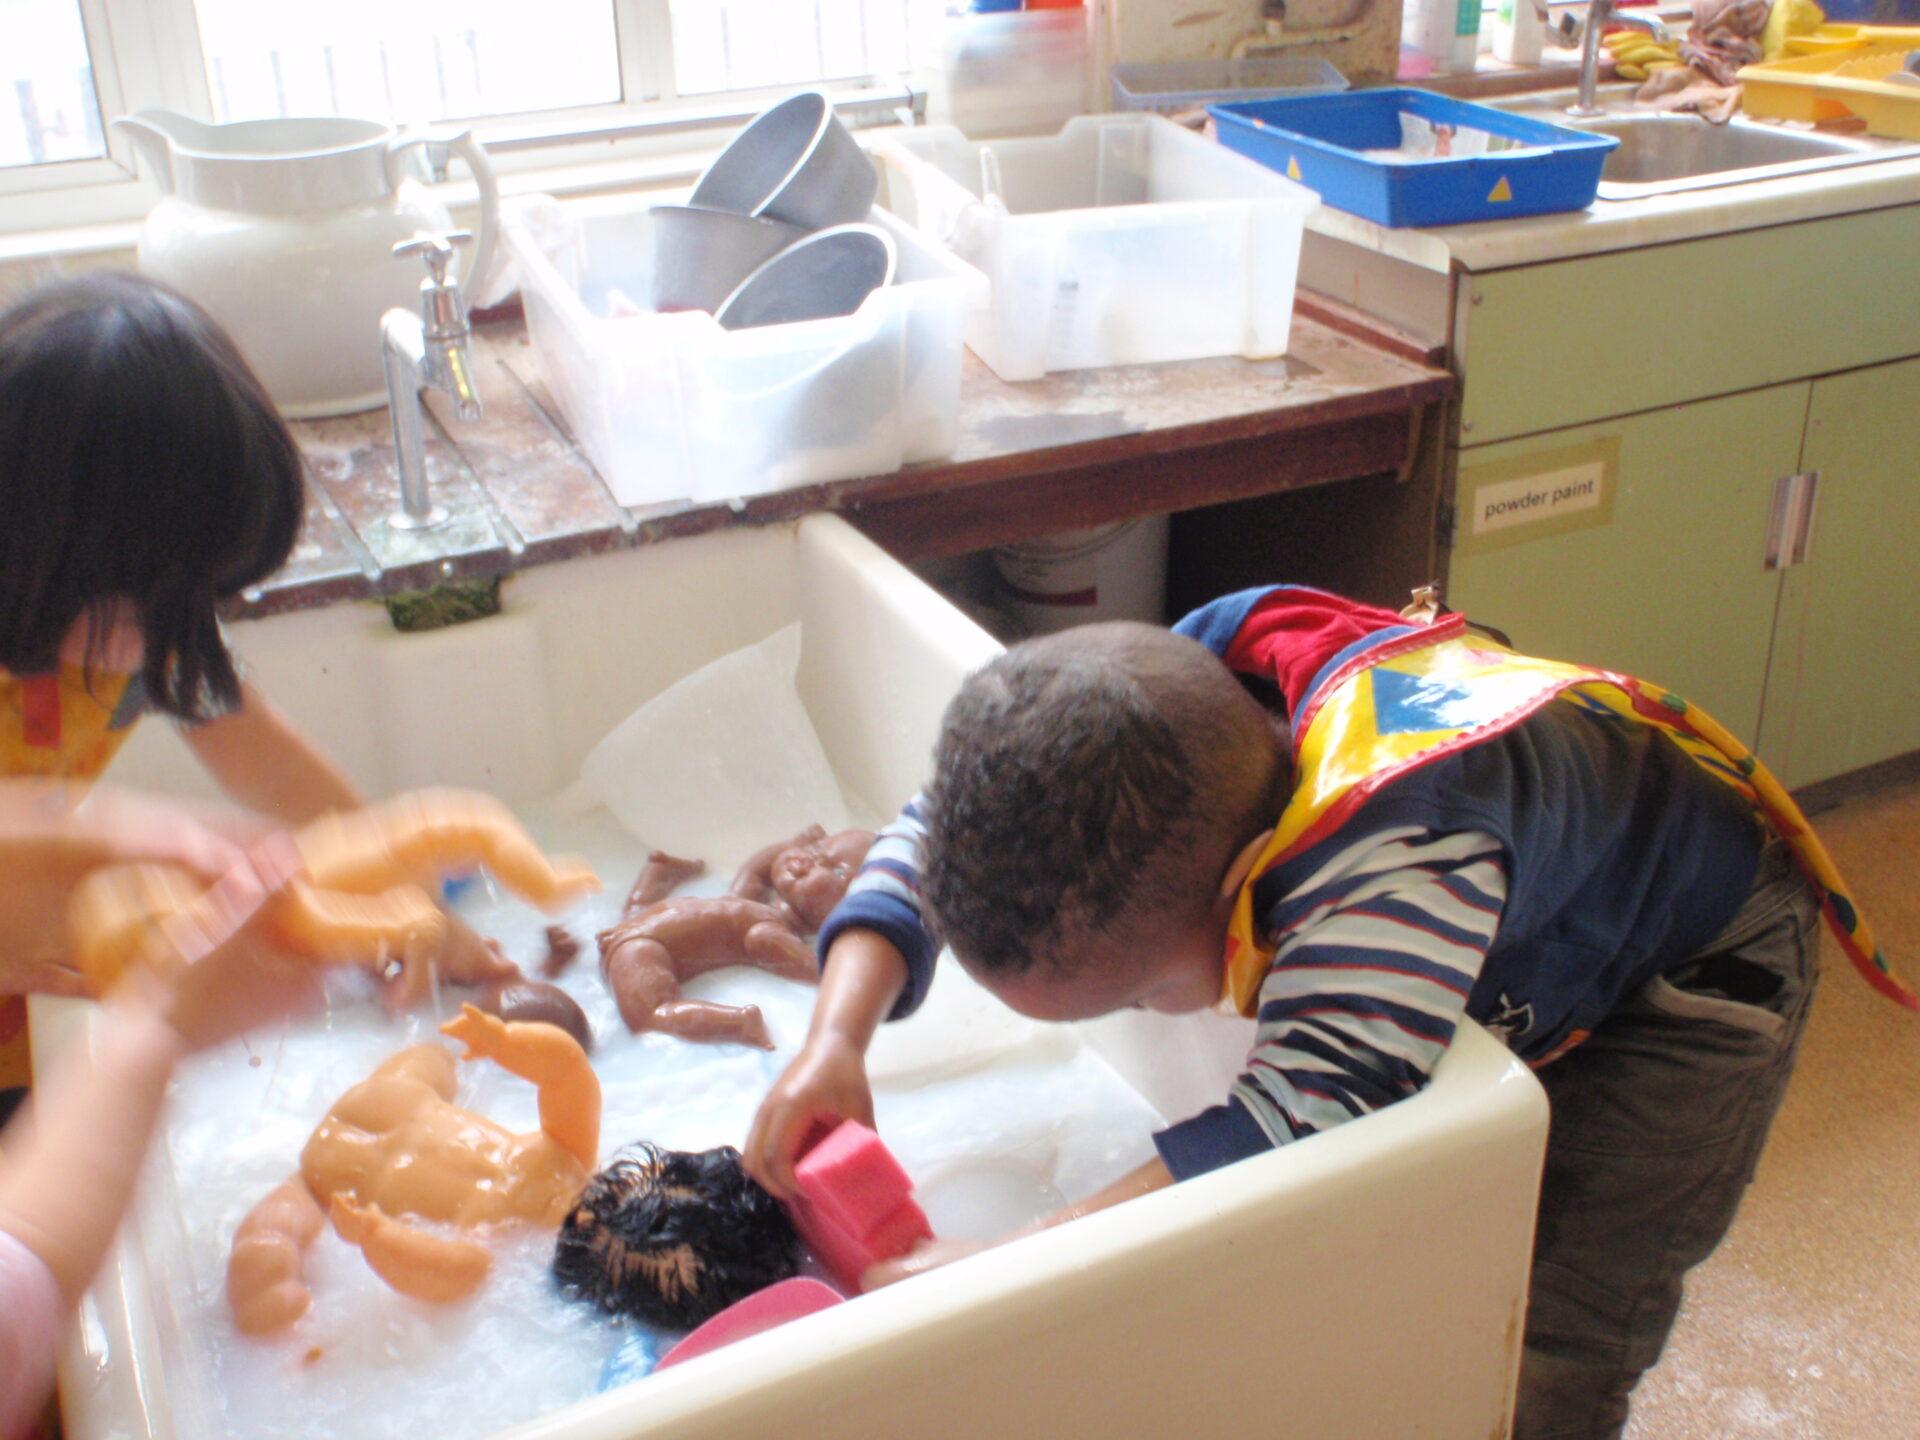 ece child observation View essay - ece 205 child development observation toddler from ece 205 at ashford university running head: child development child development observation (toddler) kimberly thomas ece 205 week 3.